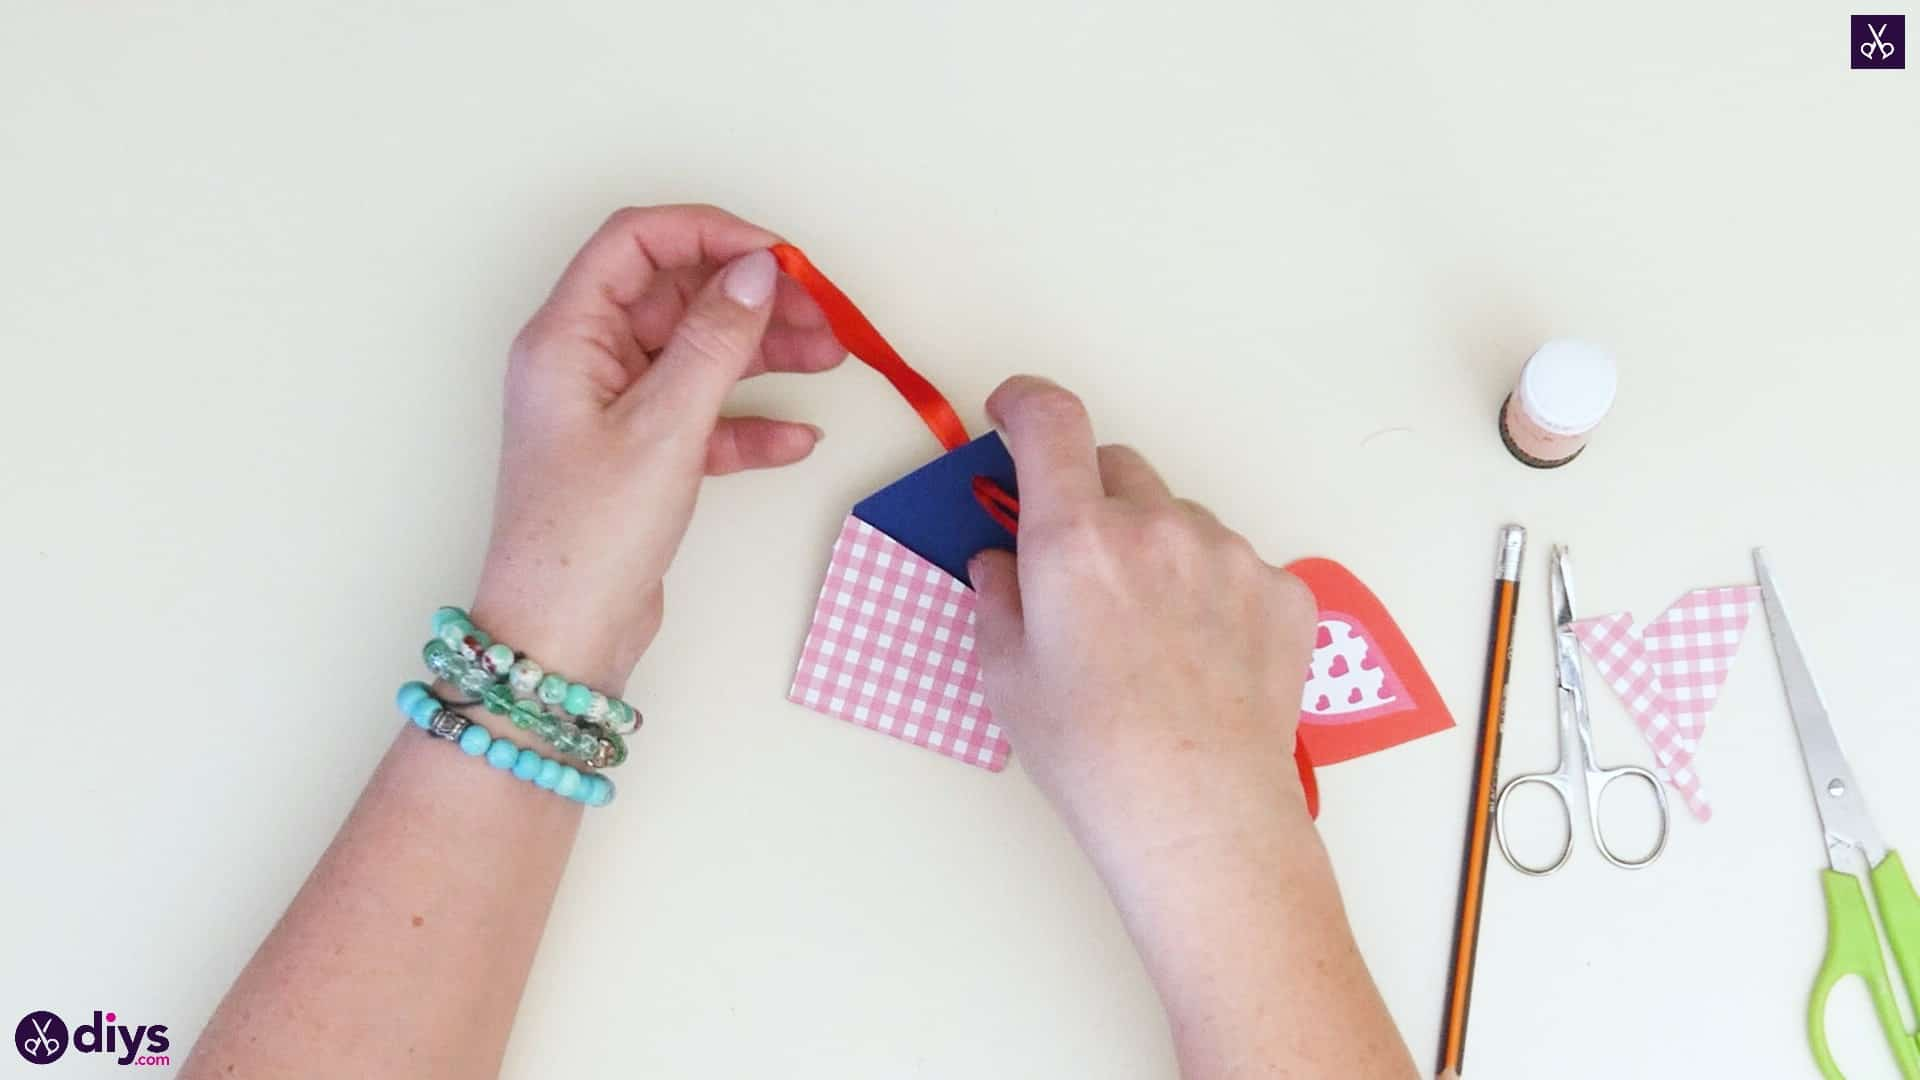 Diy pocketed gift tags step 7b